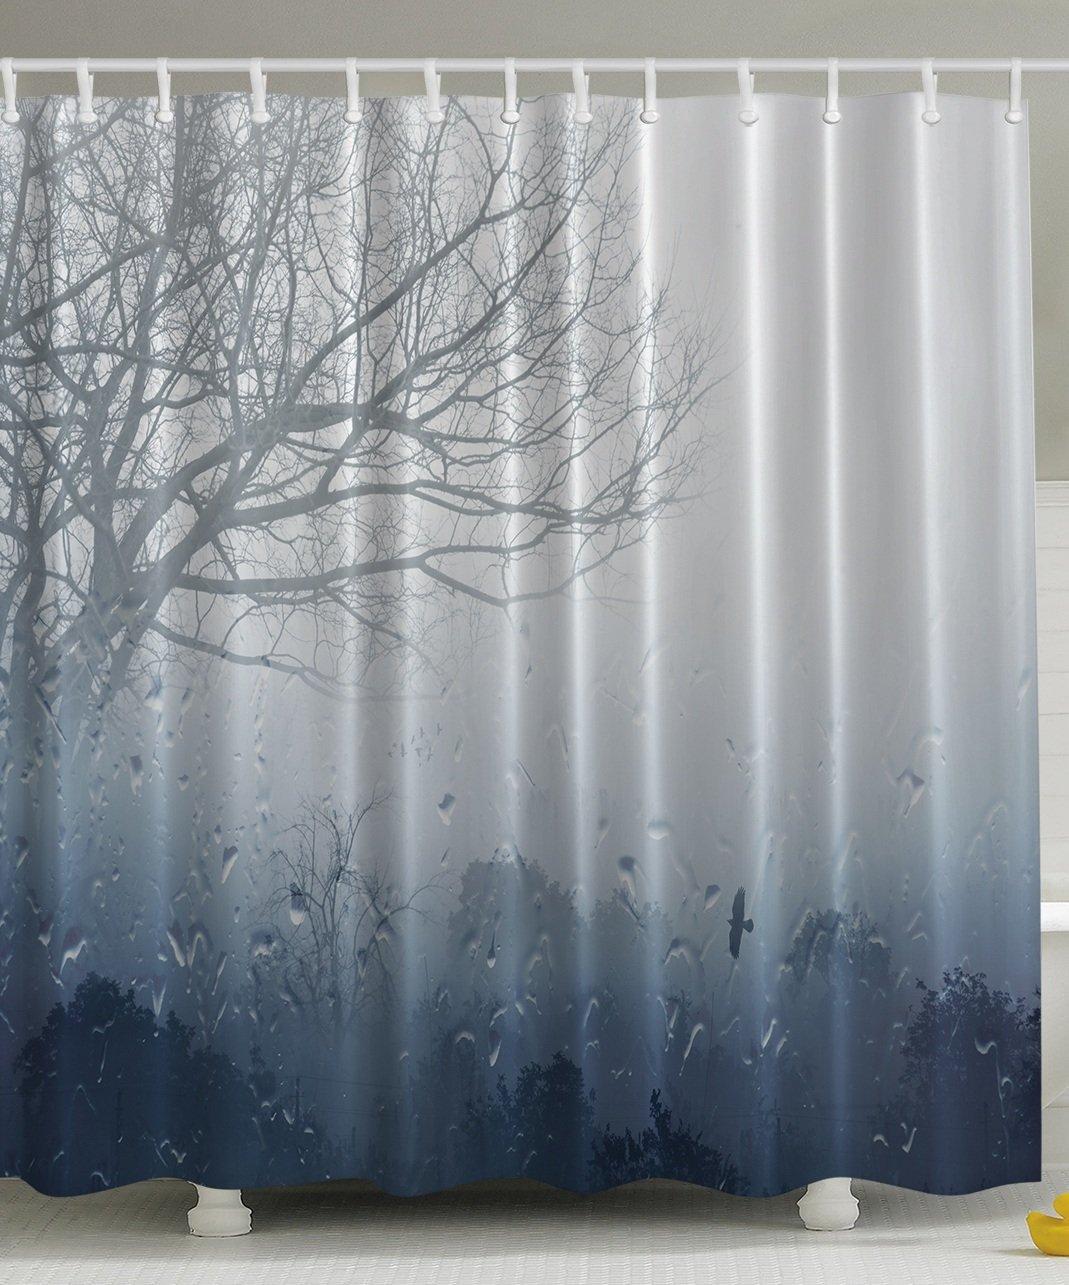 Art Prints Romantic Window Water Drops View Melancholia Therapy Lonely Tree Unique Bath